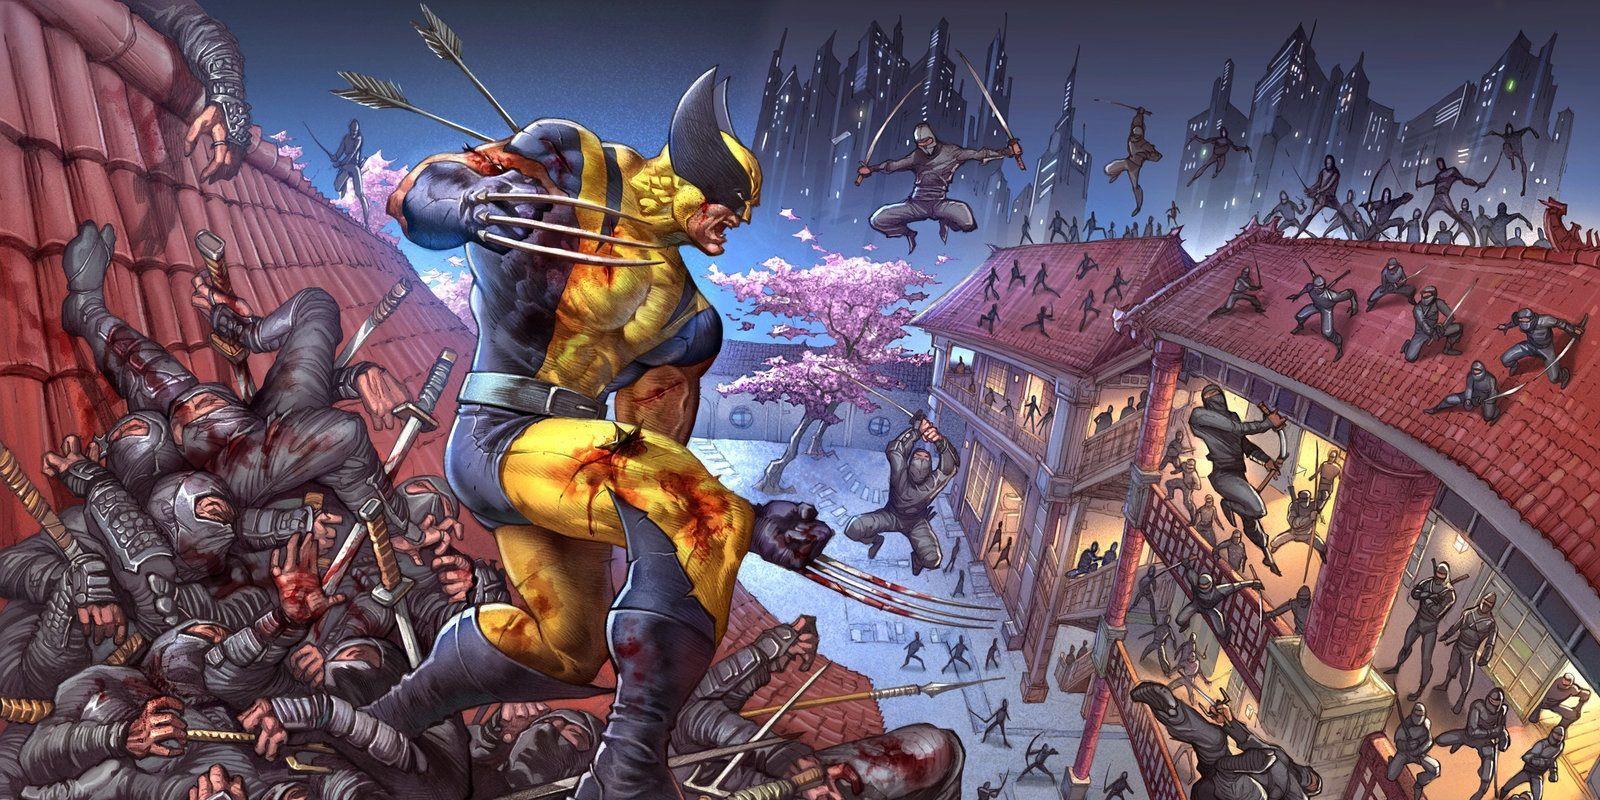 Logan cj beating off